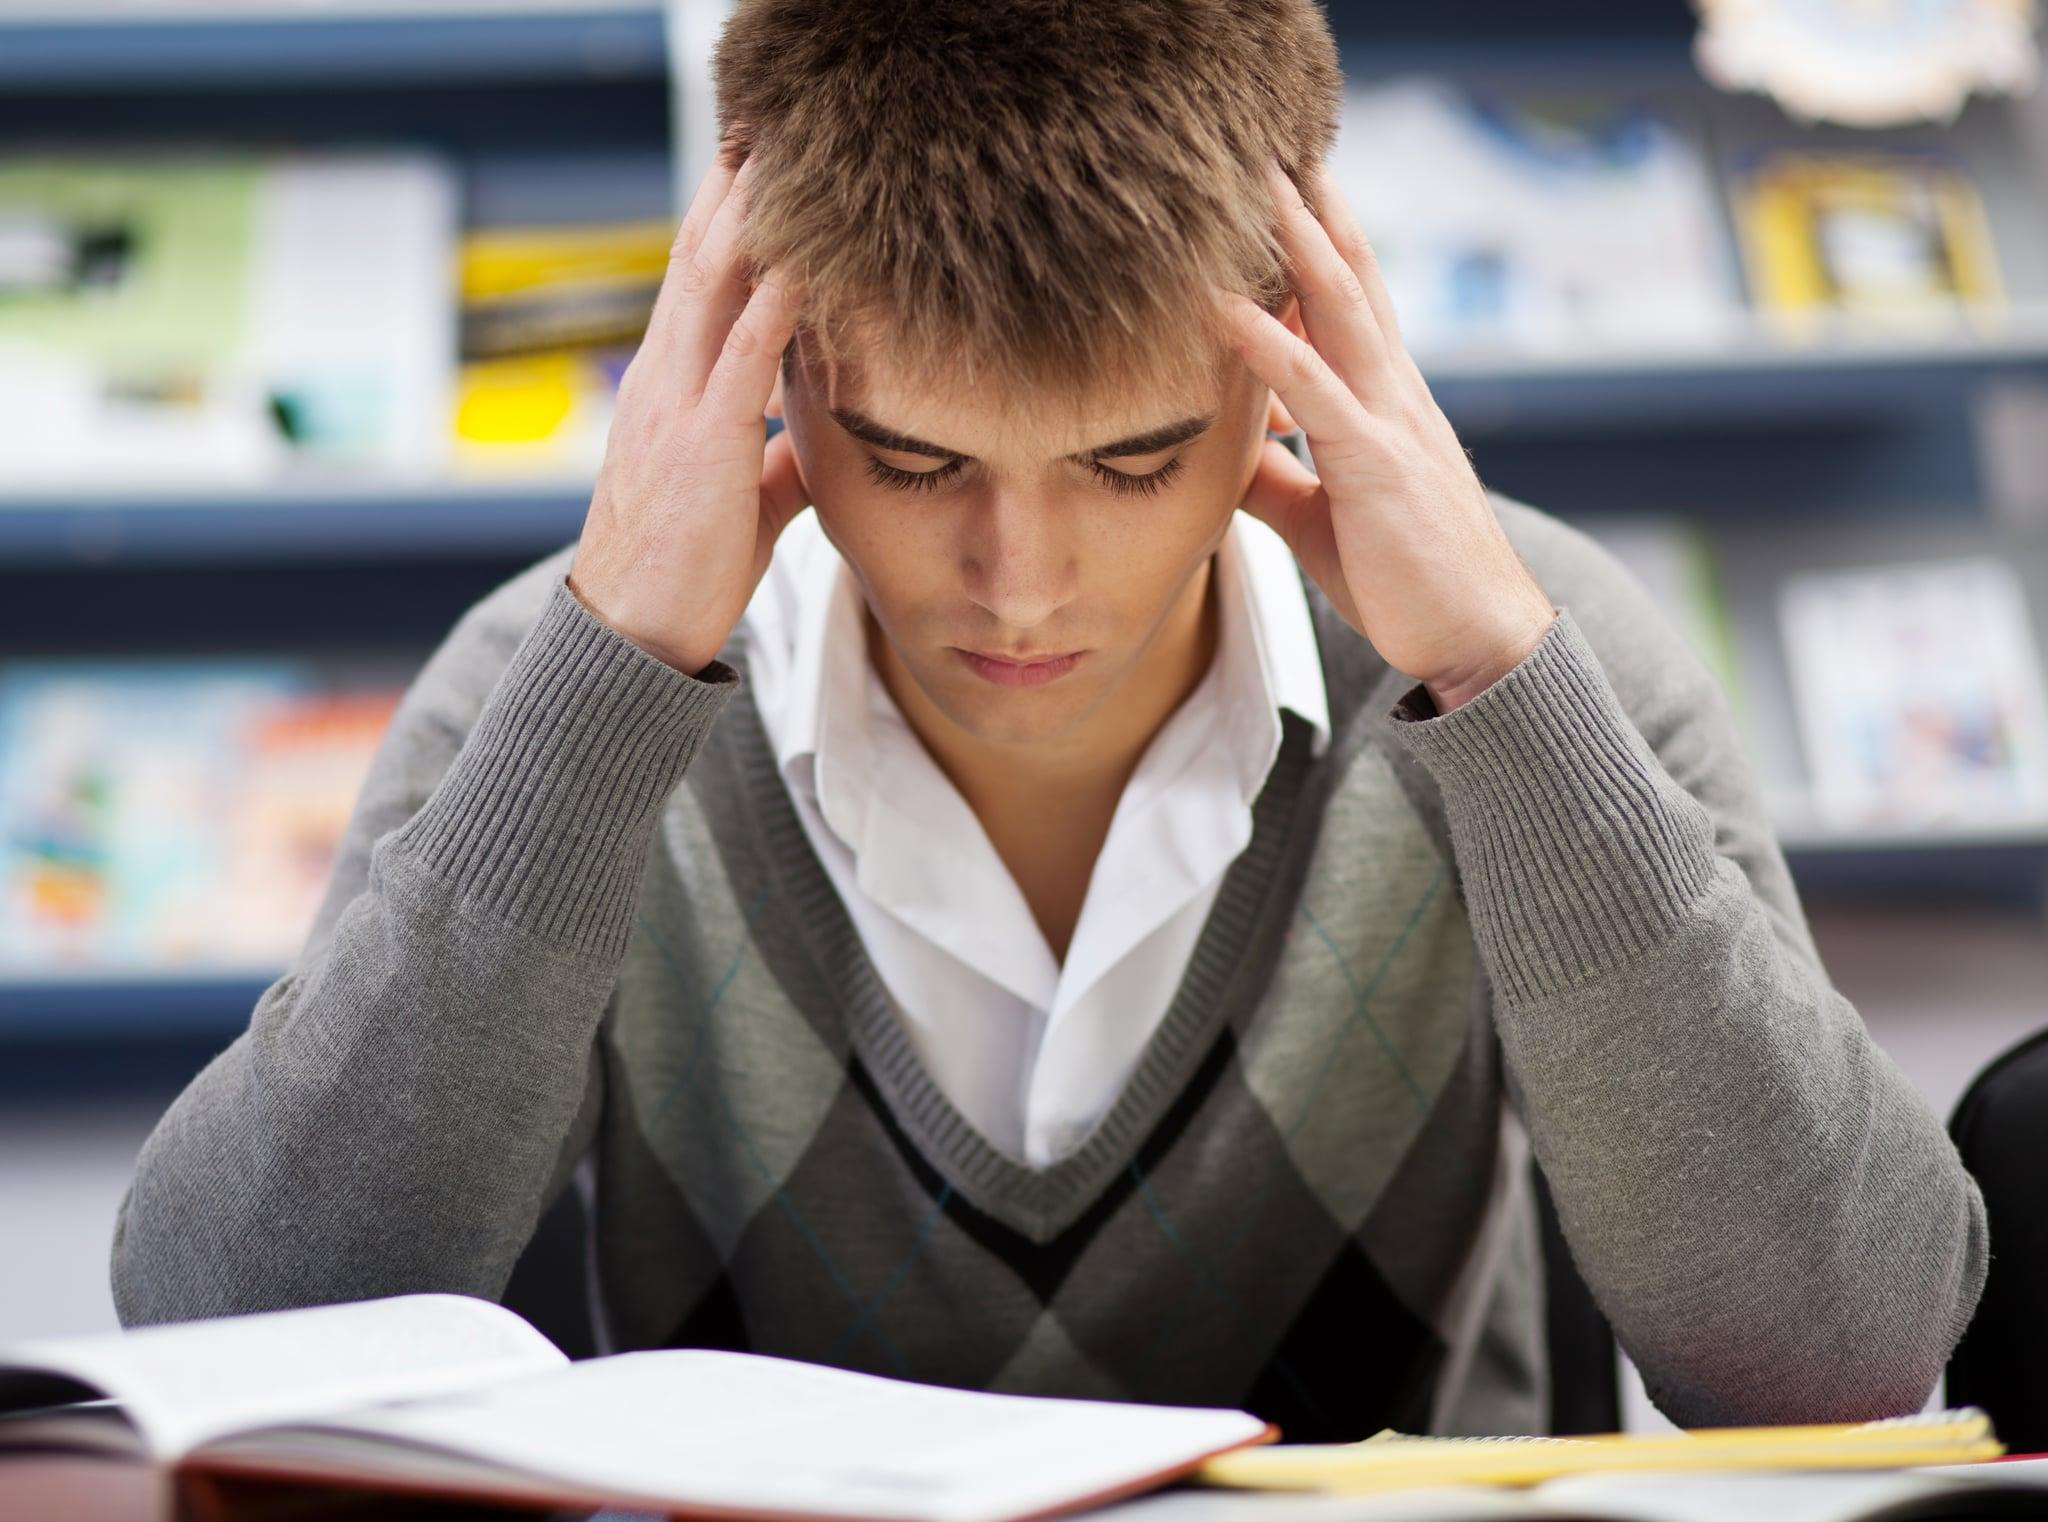 handling teen stress popsugar moms share this link